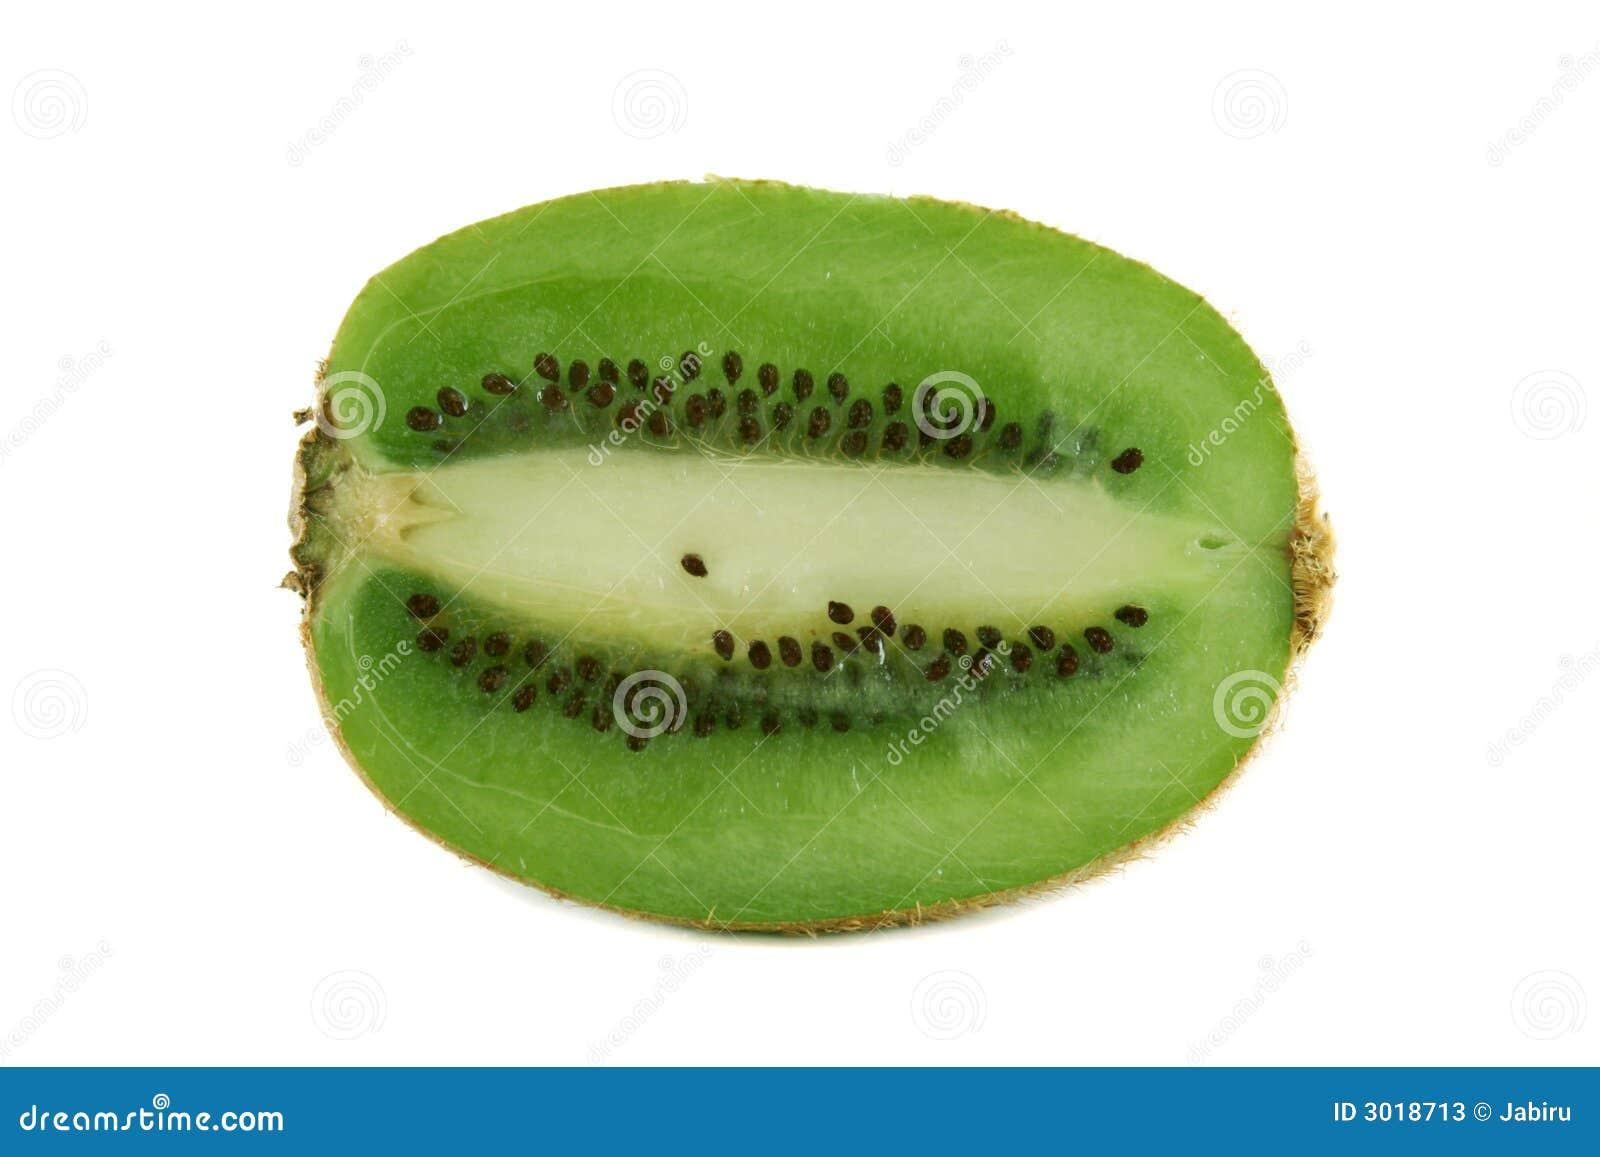 how to serve kiwi fruit